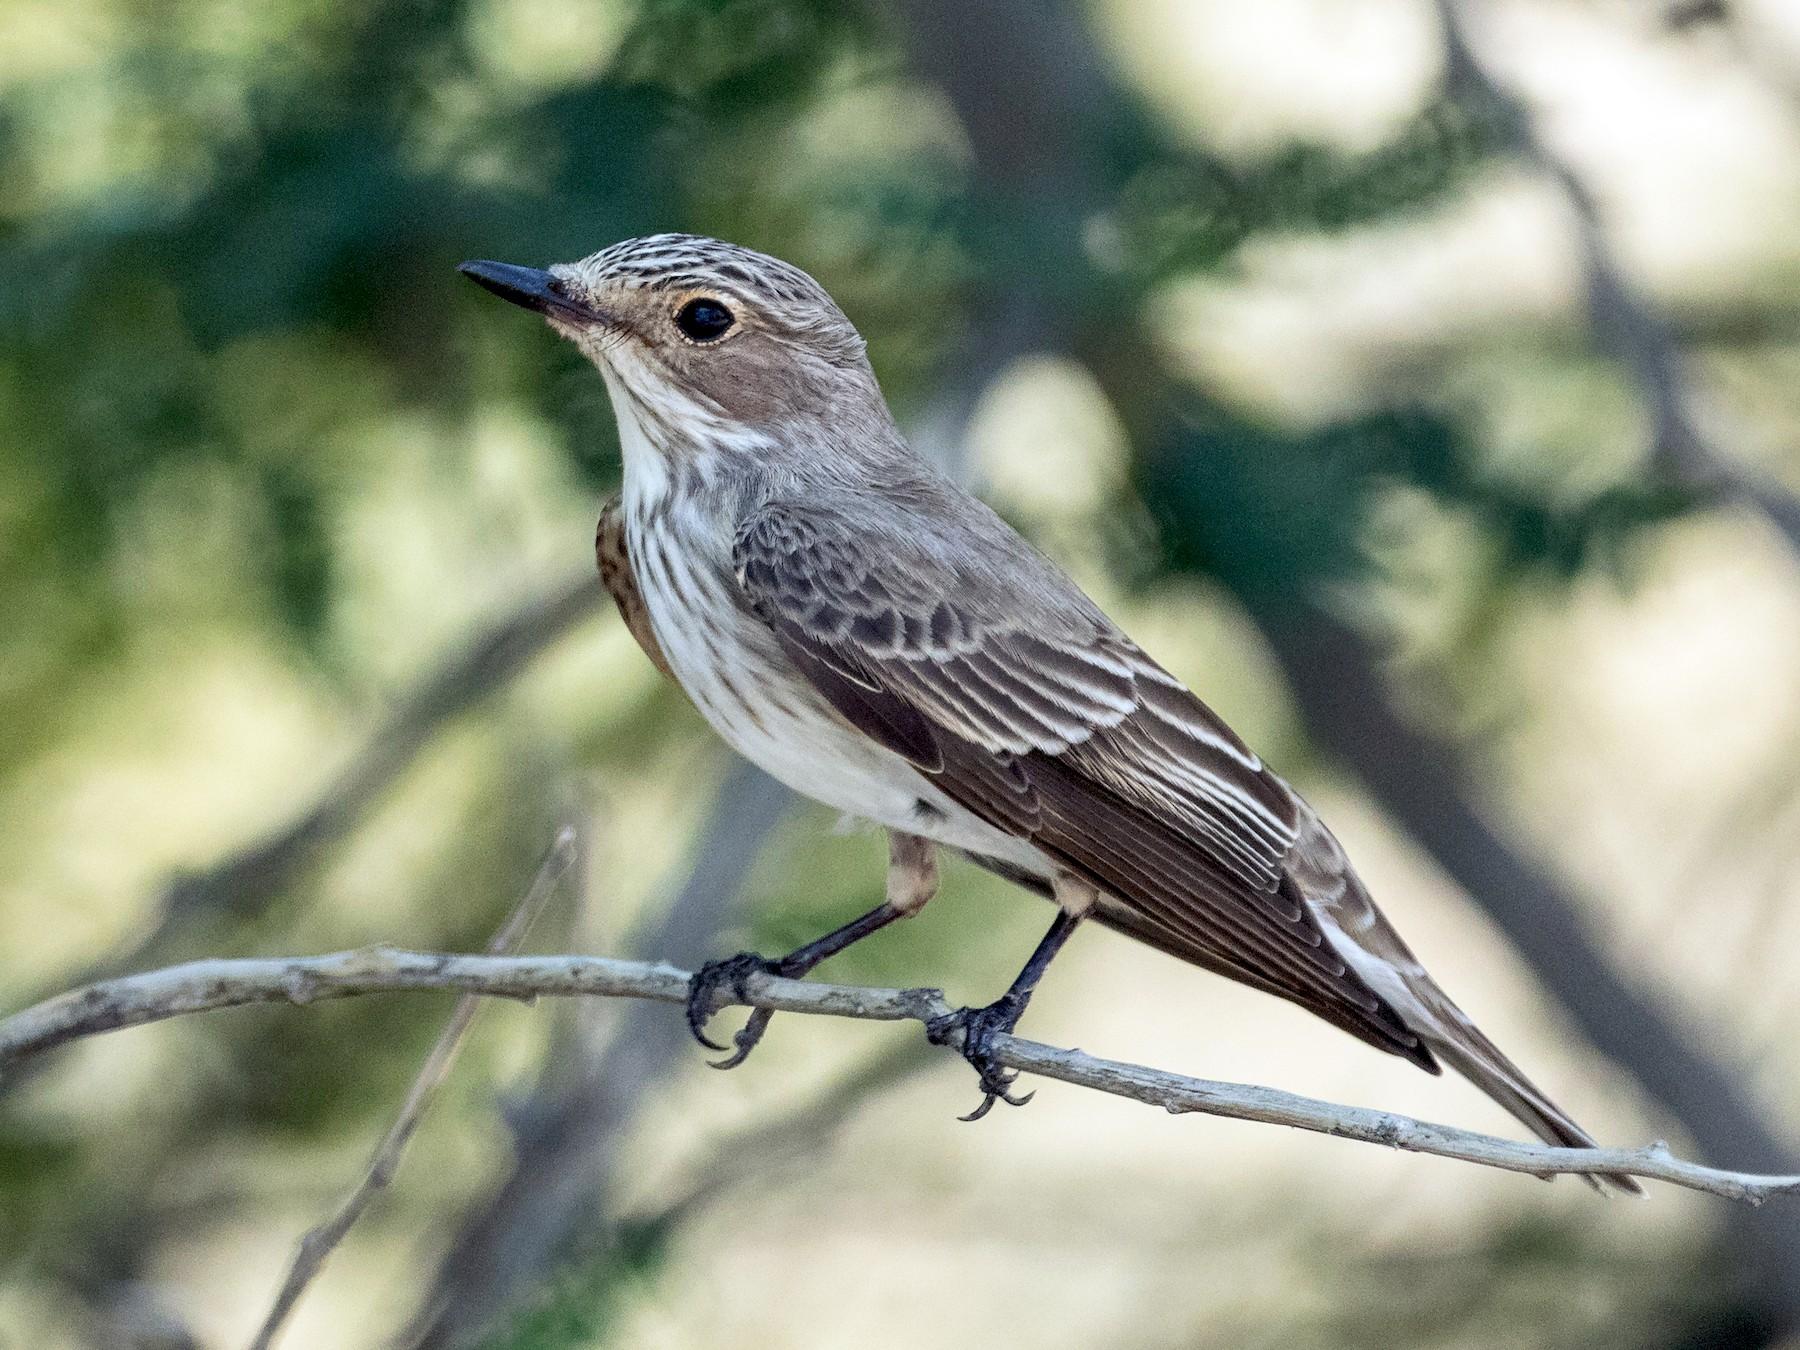 Spotted Flycatcher - Markus Craig